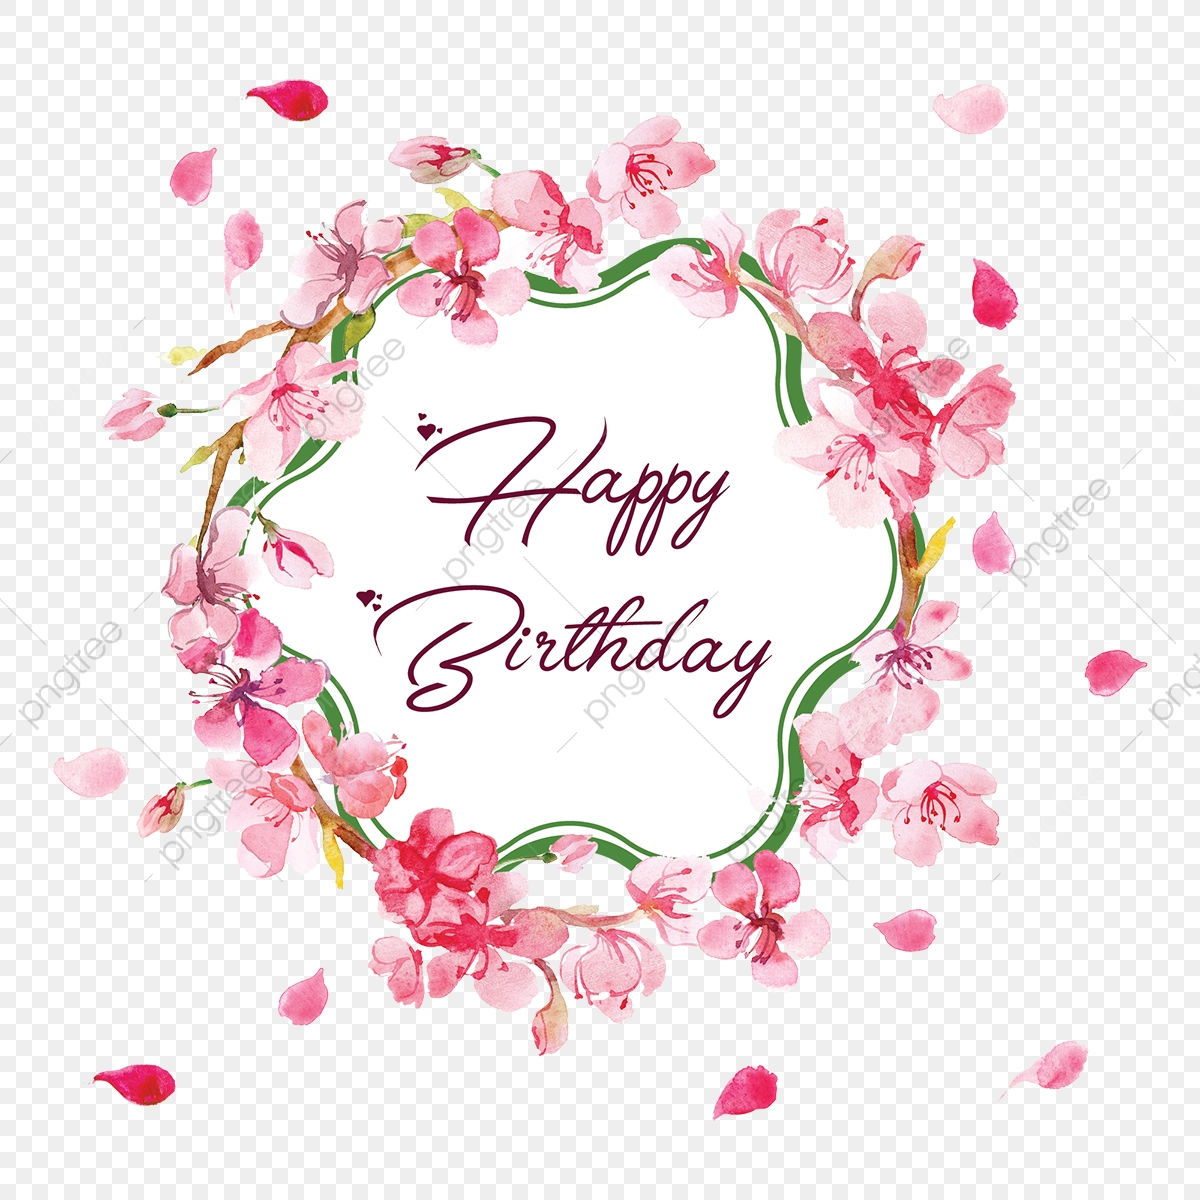 Happy Birthday Floral Frame, Border Vector, Frame Vector, Birthday Vector PNG and Vector with